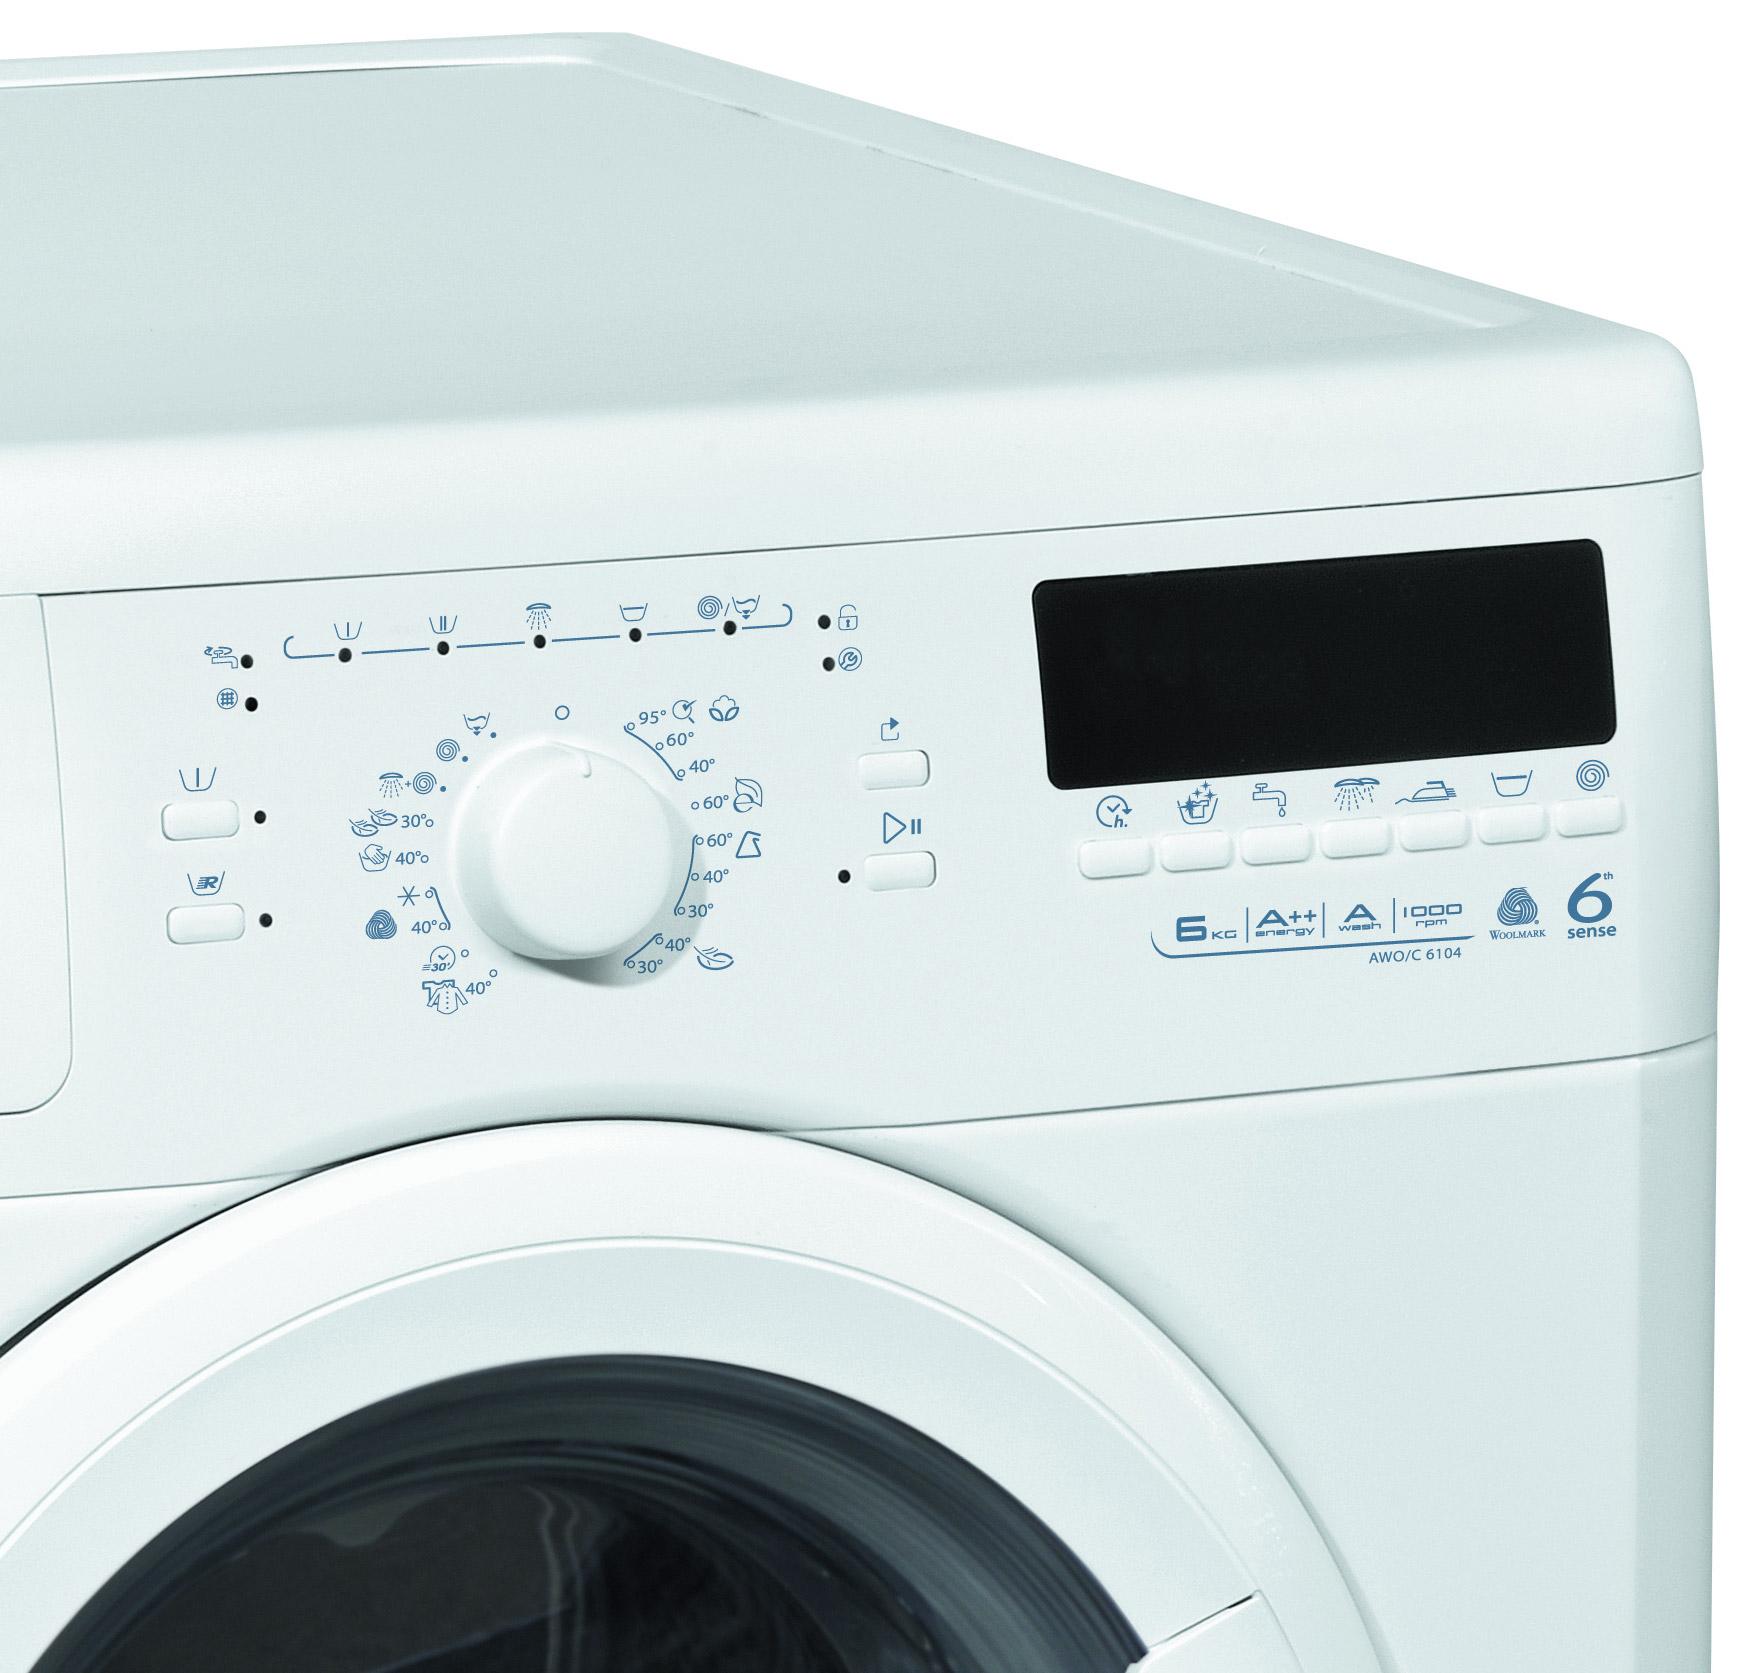 whirlpool awo c 61001ps el lt lt s mos g p grx electro. Black Bedroom Furniture Sets. Home Design Ideas